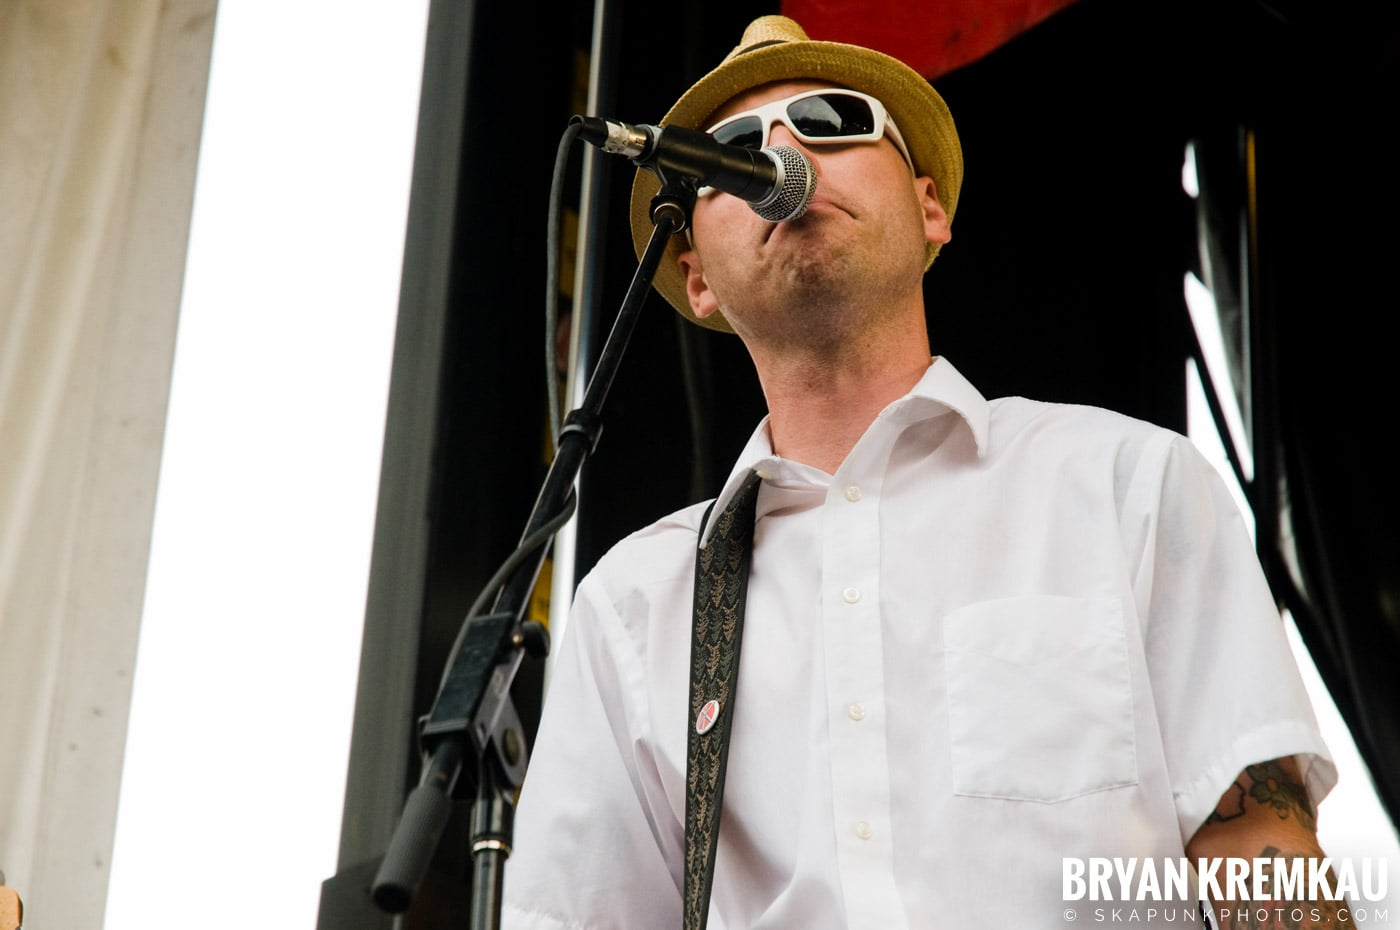 Flogging Molly @ Warped Tour 2009, Scranton PA - 07.15.09 (17)